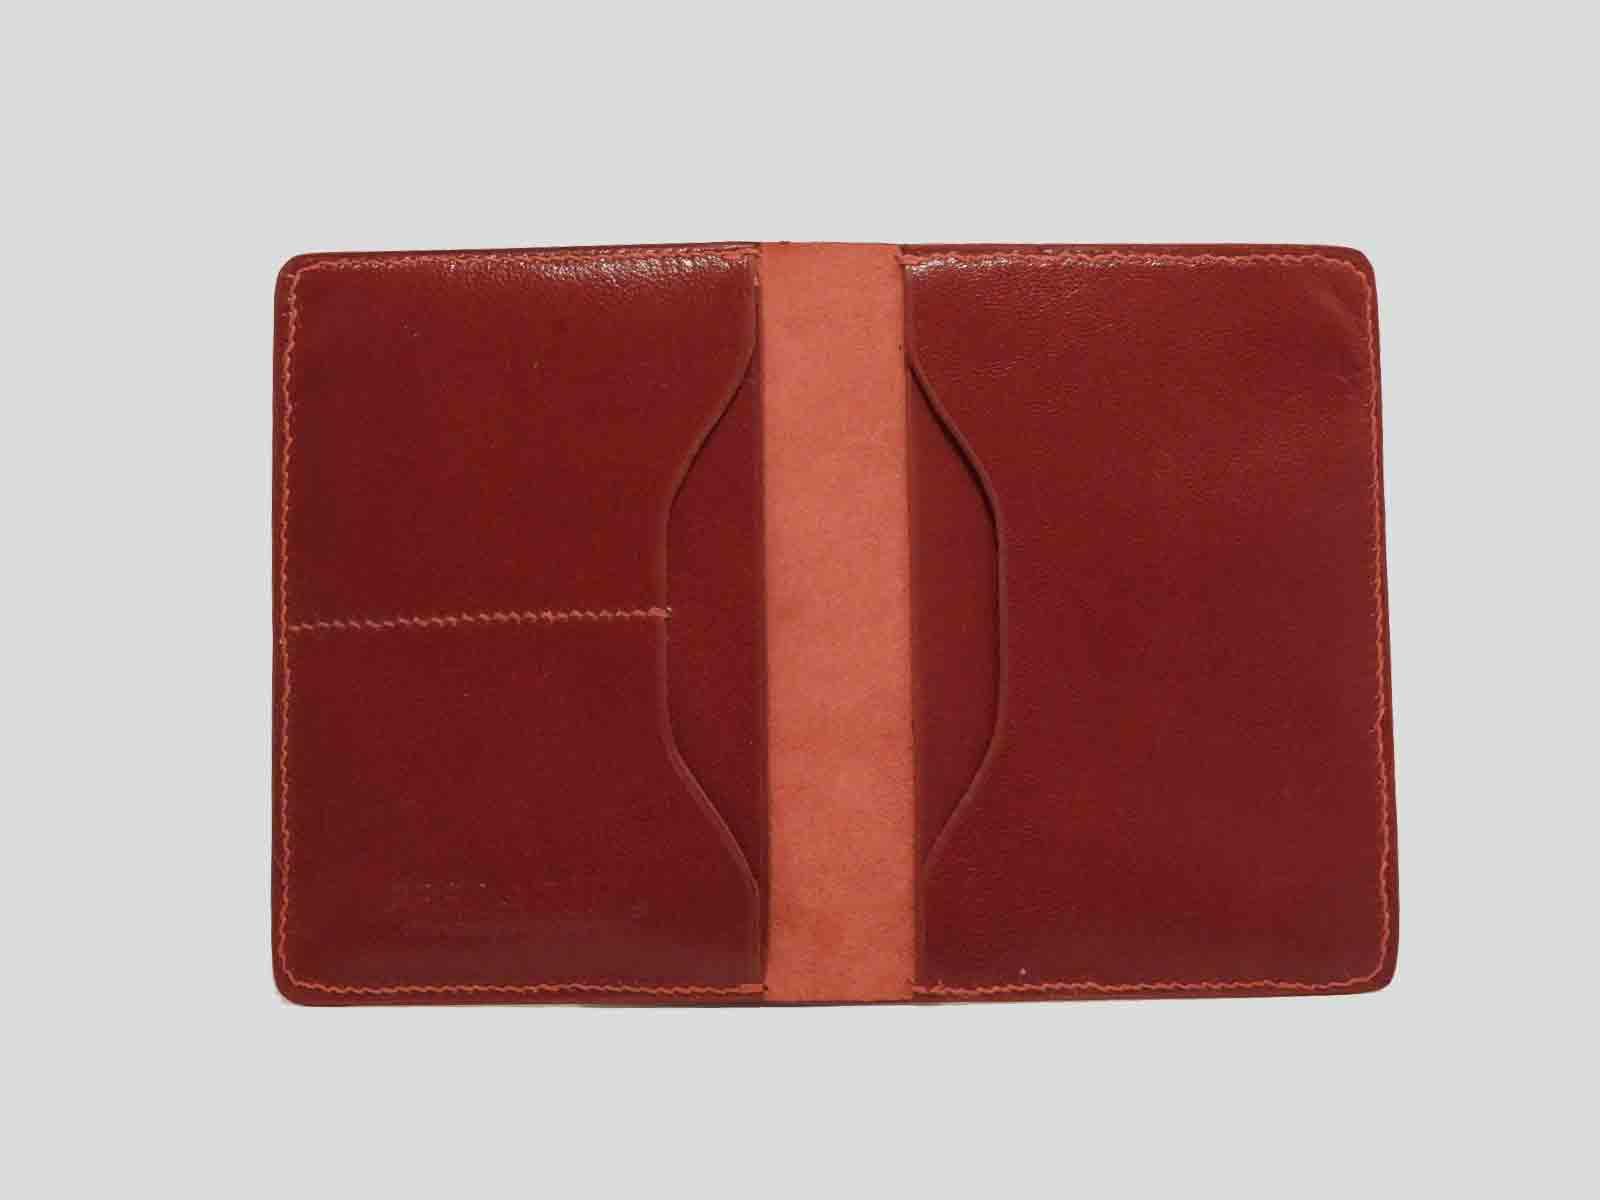 BALI protège passeport en cuir de veau rouge framboise